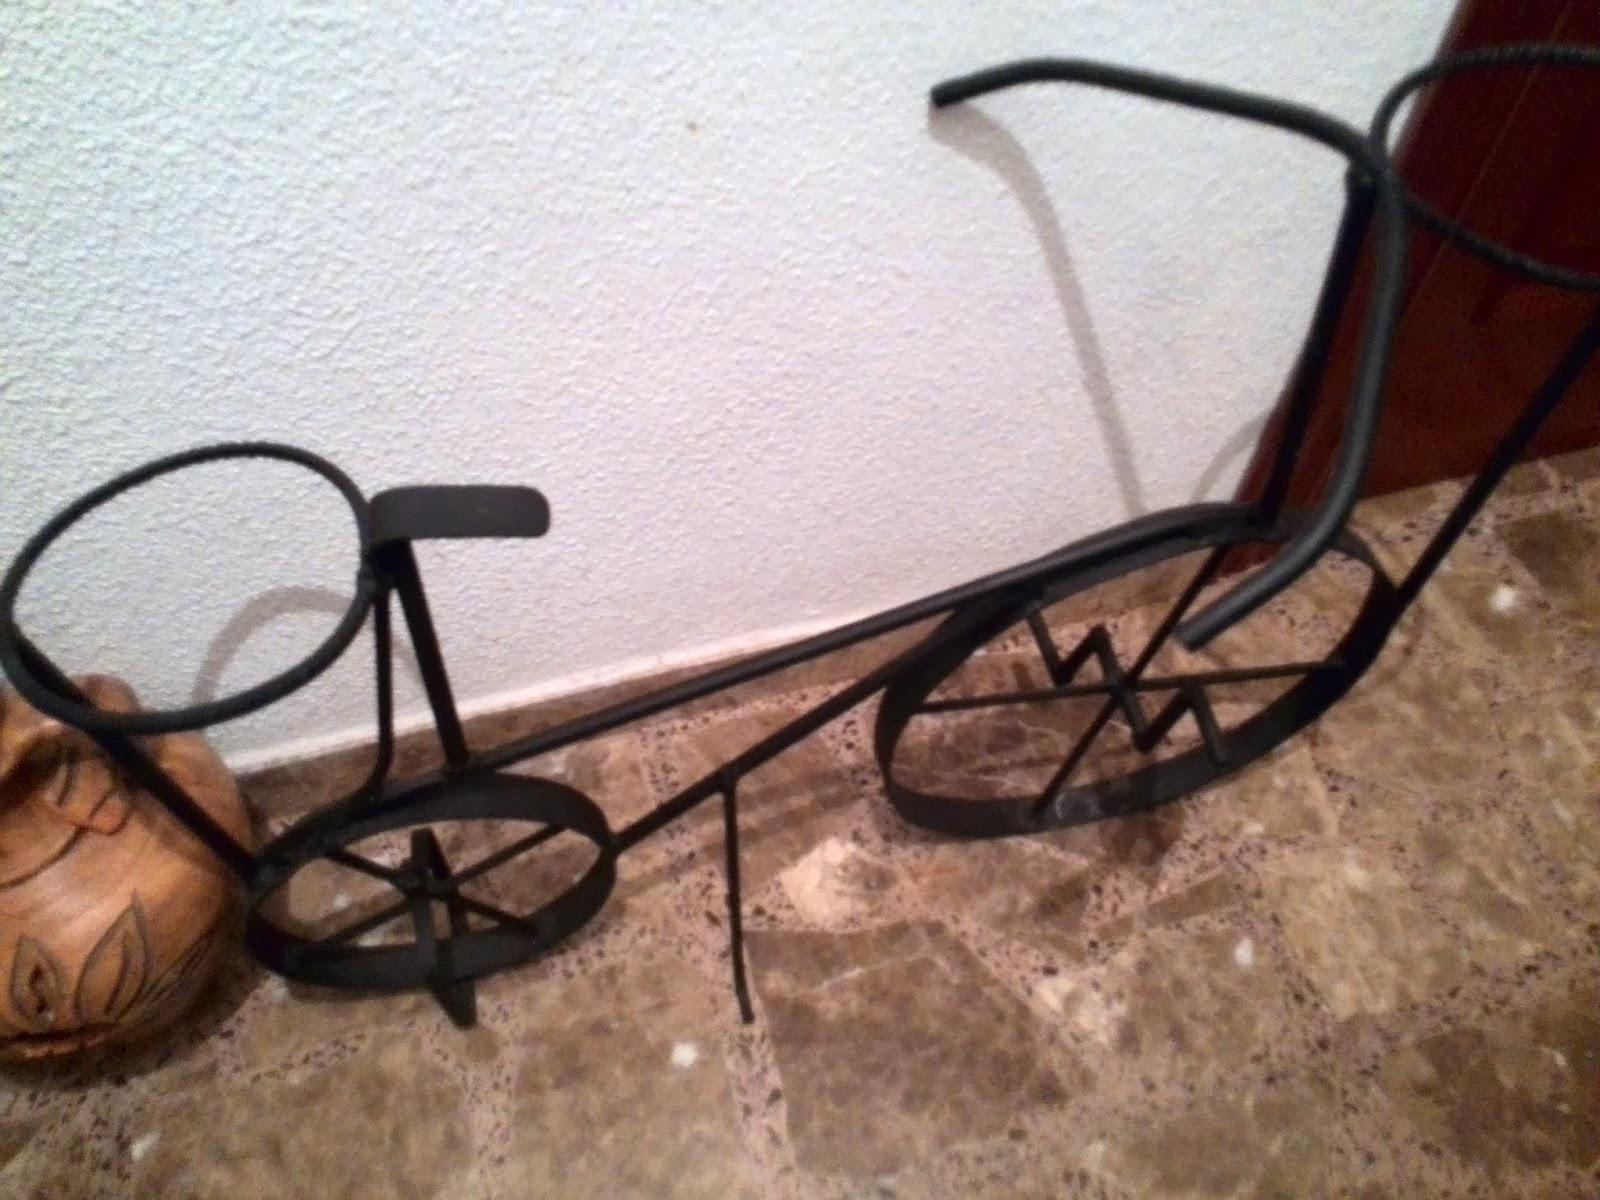 Artesan a y forja bicicleta macetero - Bicicleta macetero ...